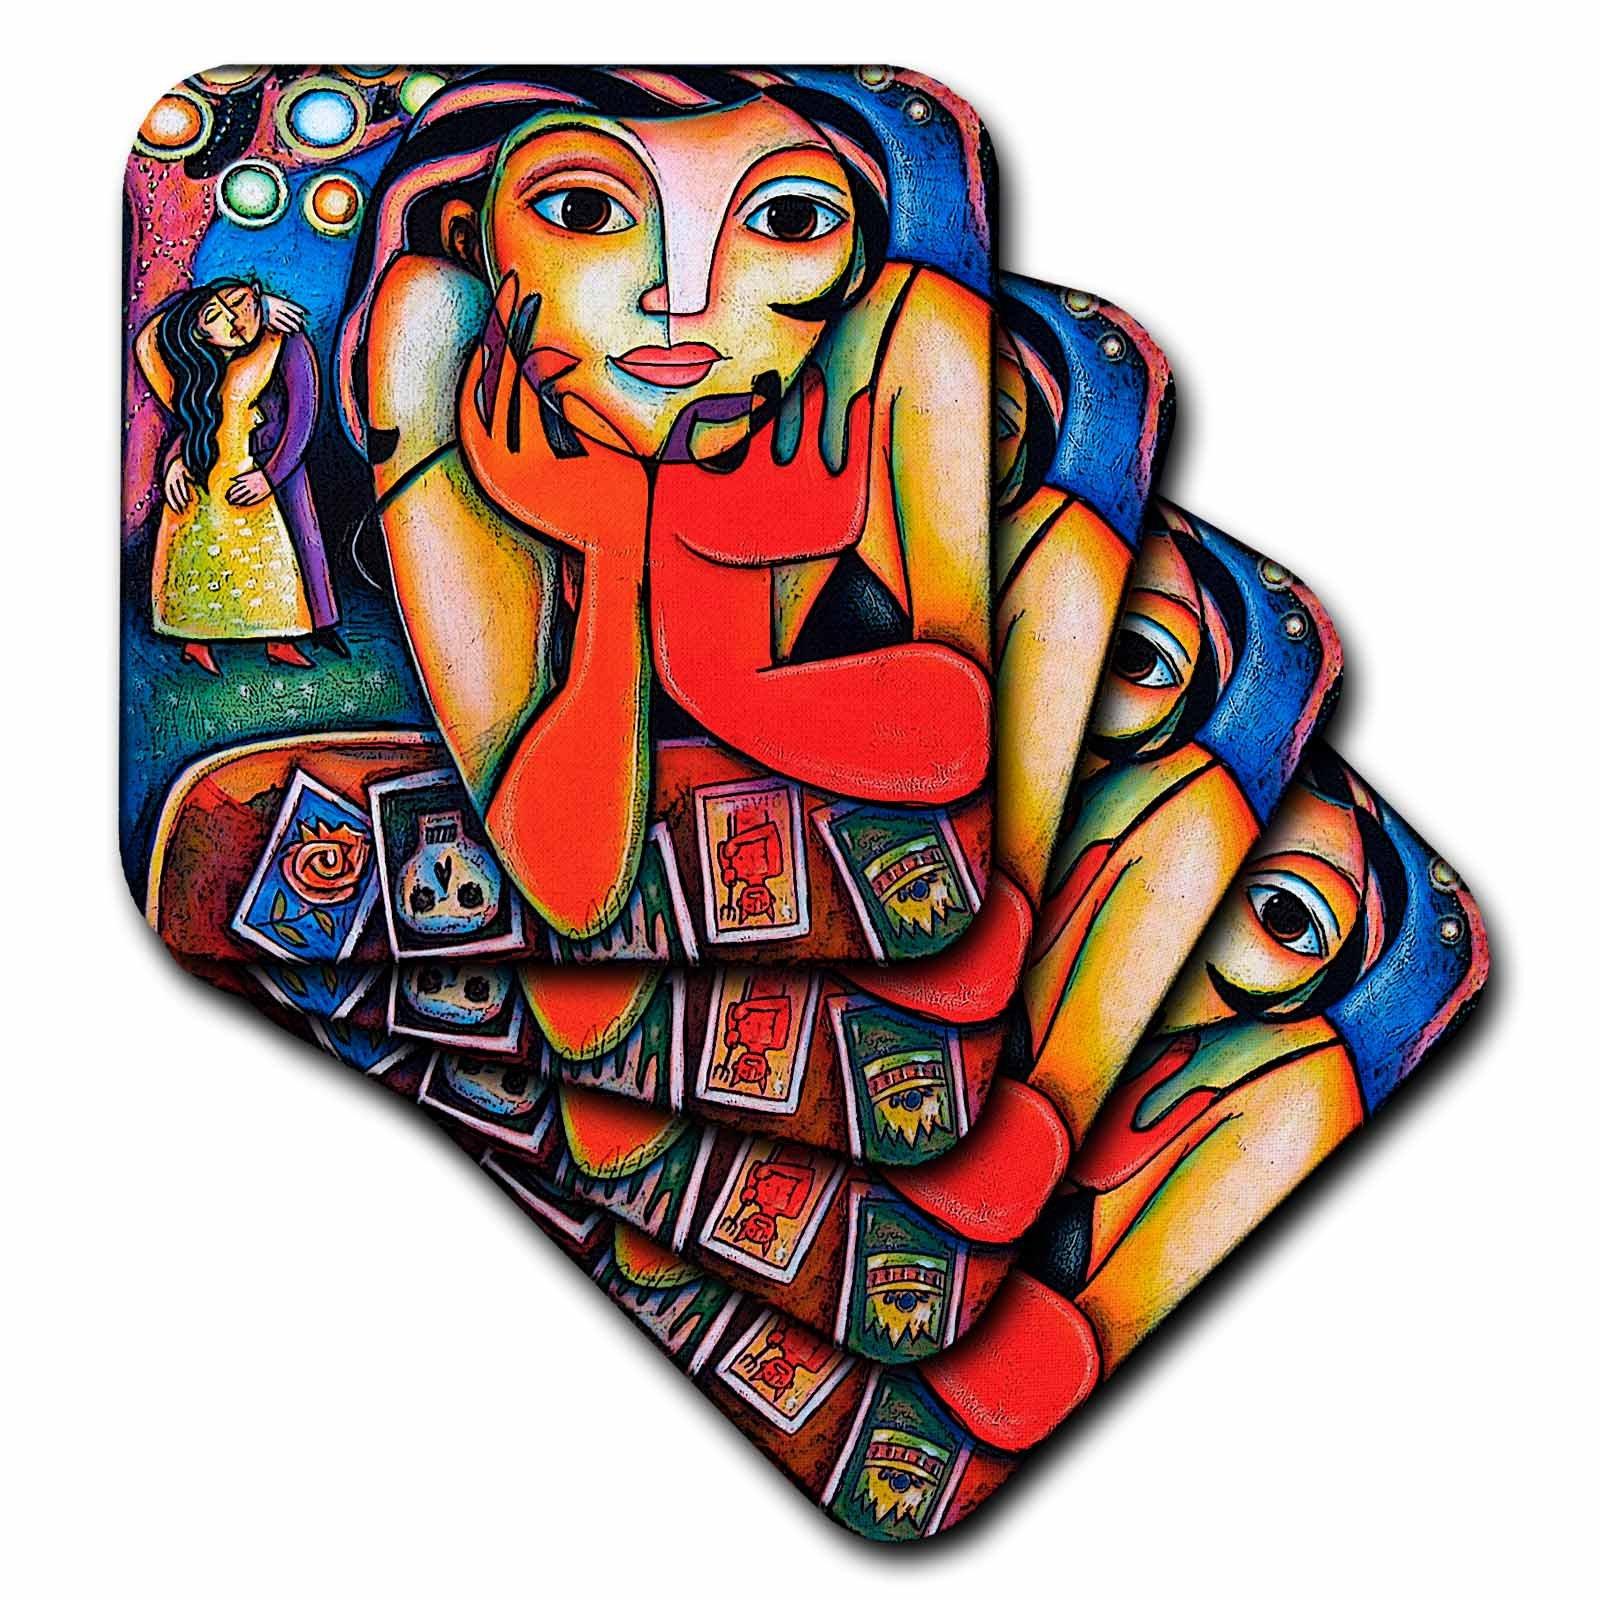 3dRose cst_21203_3 Loteri a Woman Colorful Romance Dance Lottery Party Ceramic Tile Coasters (Set of 4)